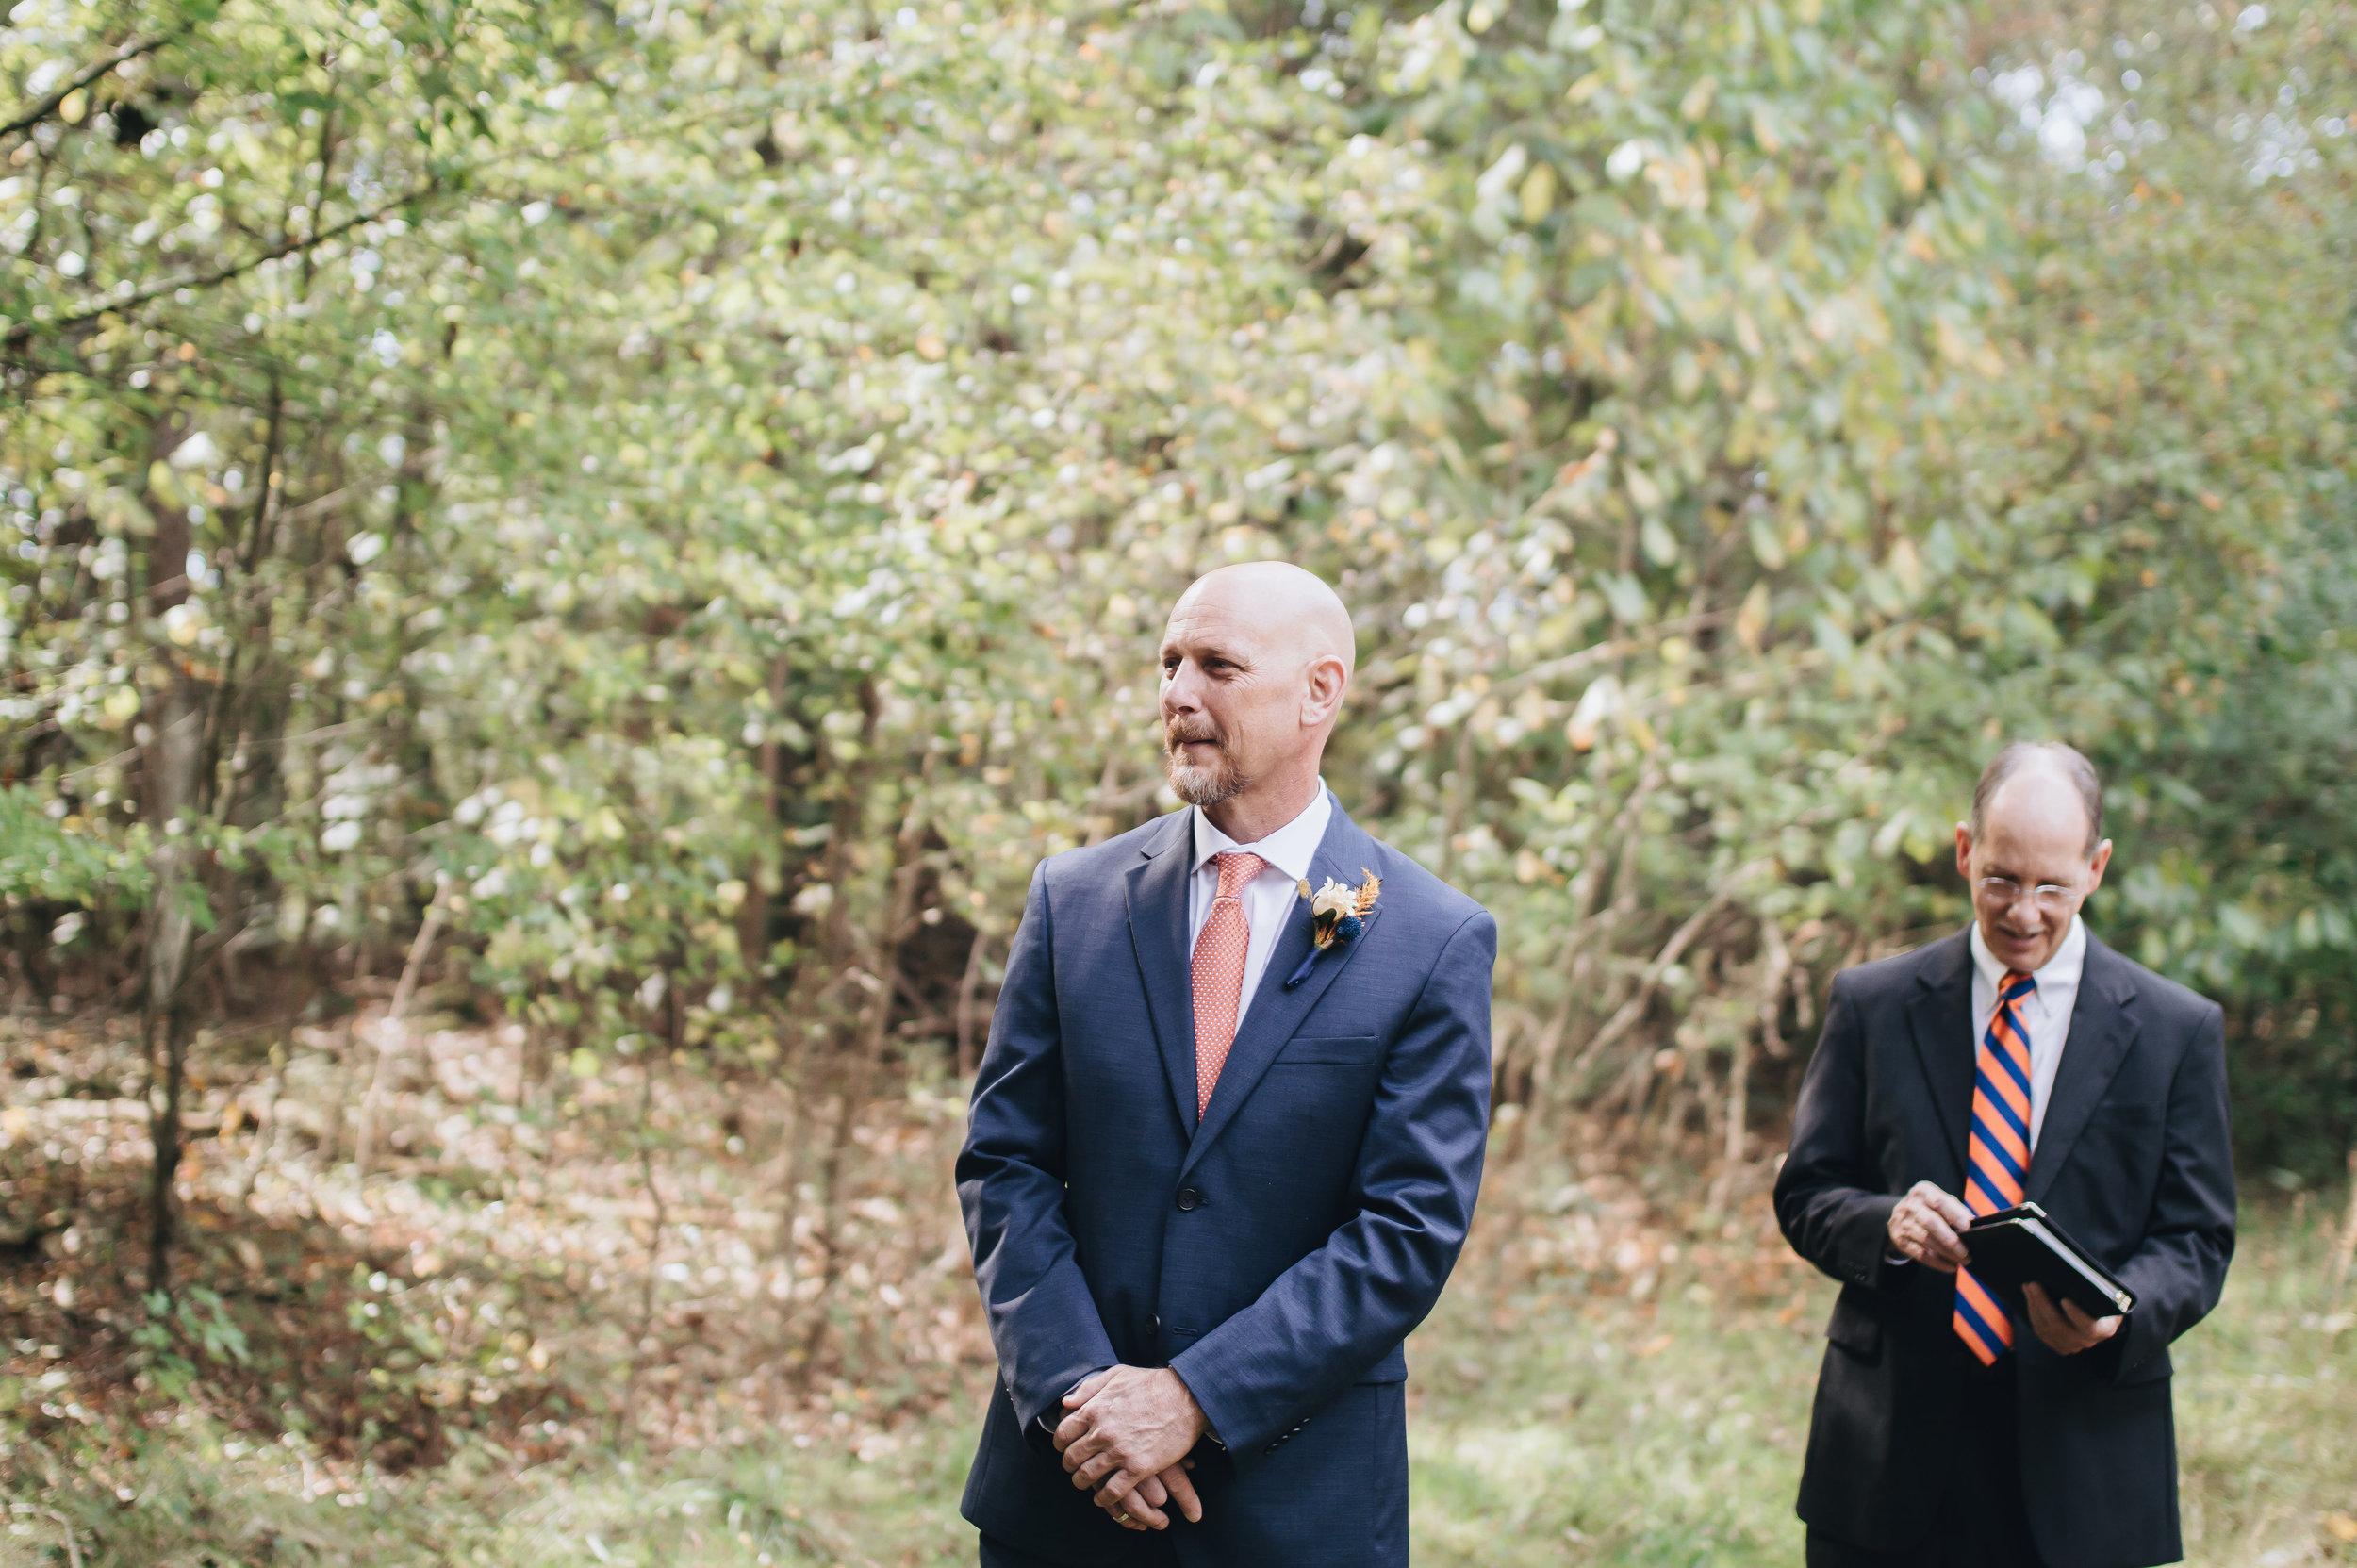 Crystal and Michael Wedding - EDITS-0008.jpg